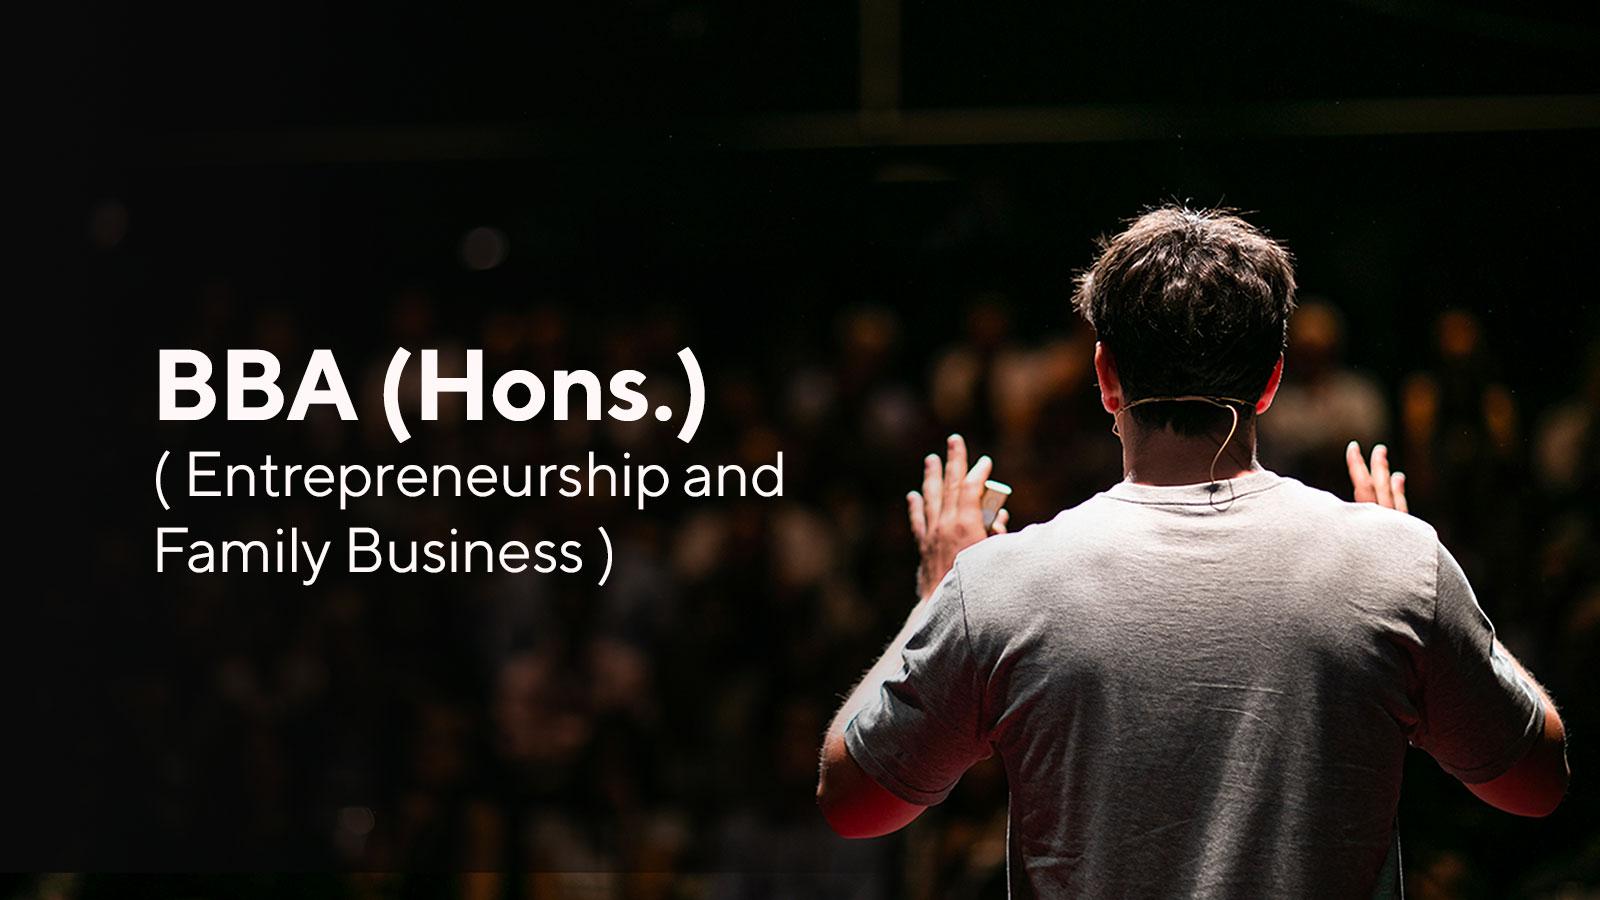 B.B.A. (Hons.) Entrepreneurship and Family Business Image